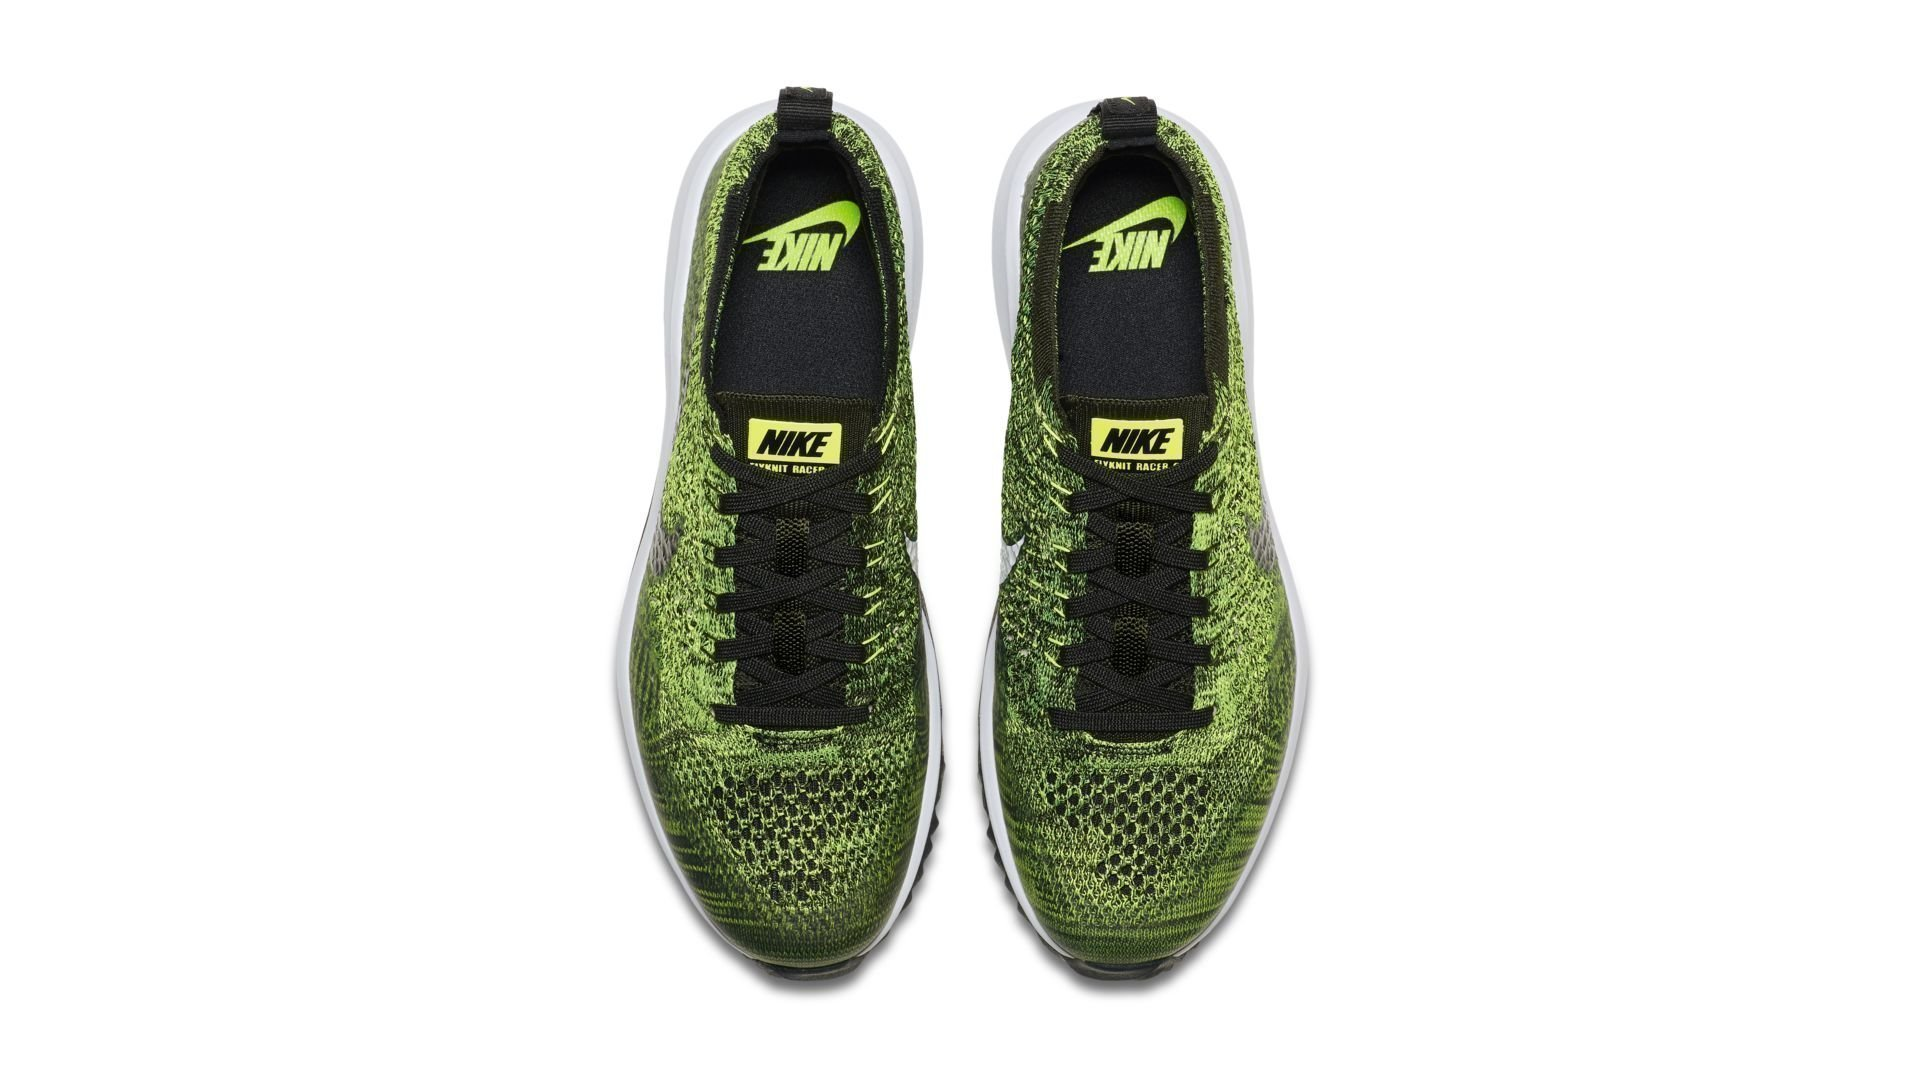 Nike Flyknit Racer G Volt Sequoia Black (W) (909769-700)